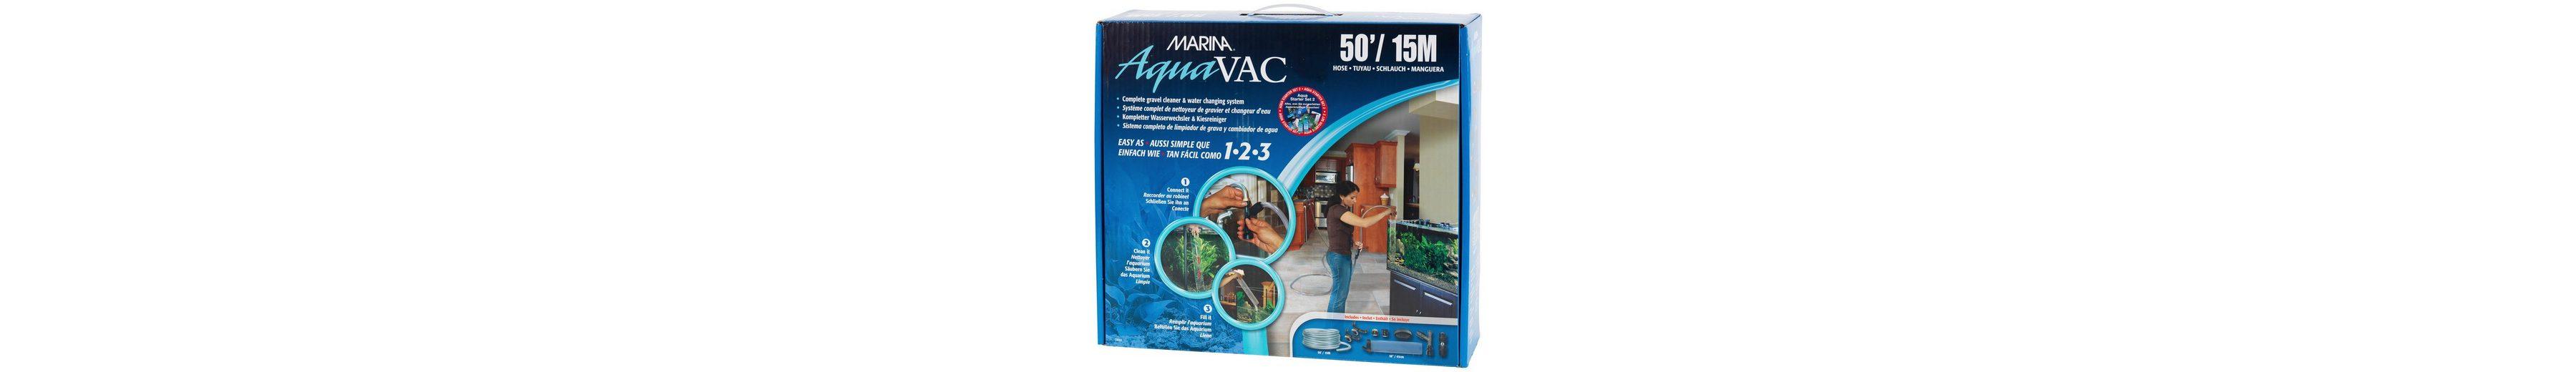 Aquariumpflege »Aqua Vac Starterpaket 2« (15 m)